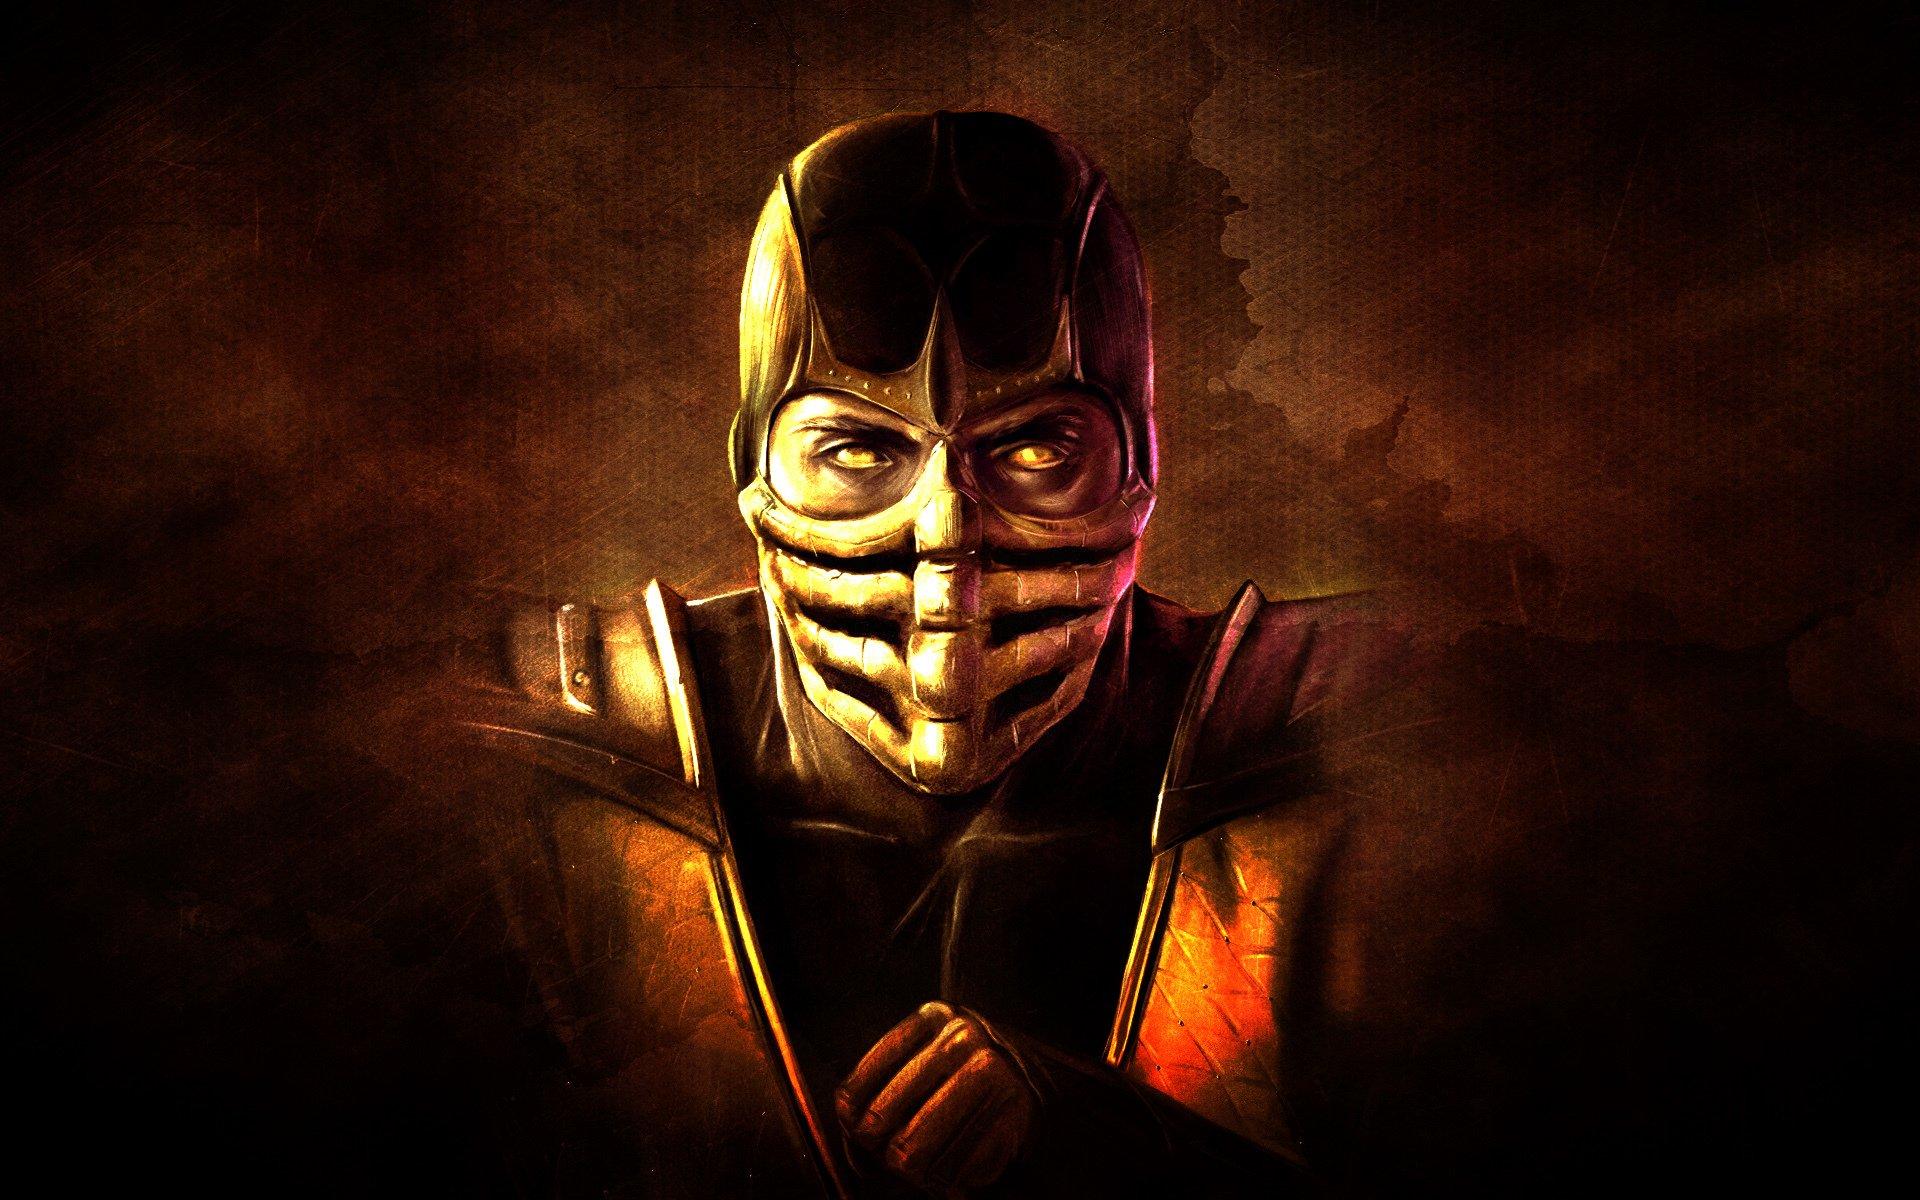 62 Scorpion Mortal Kombat Hd Wallpapers Background Images